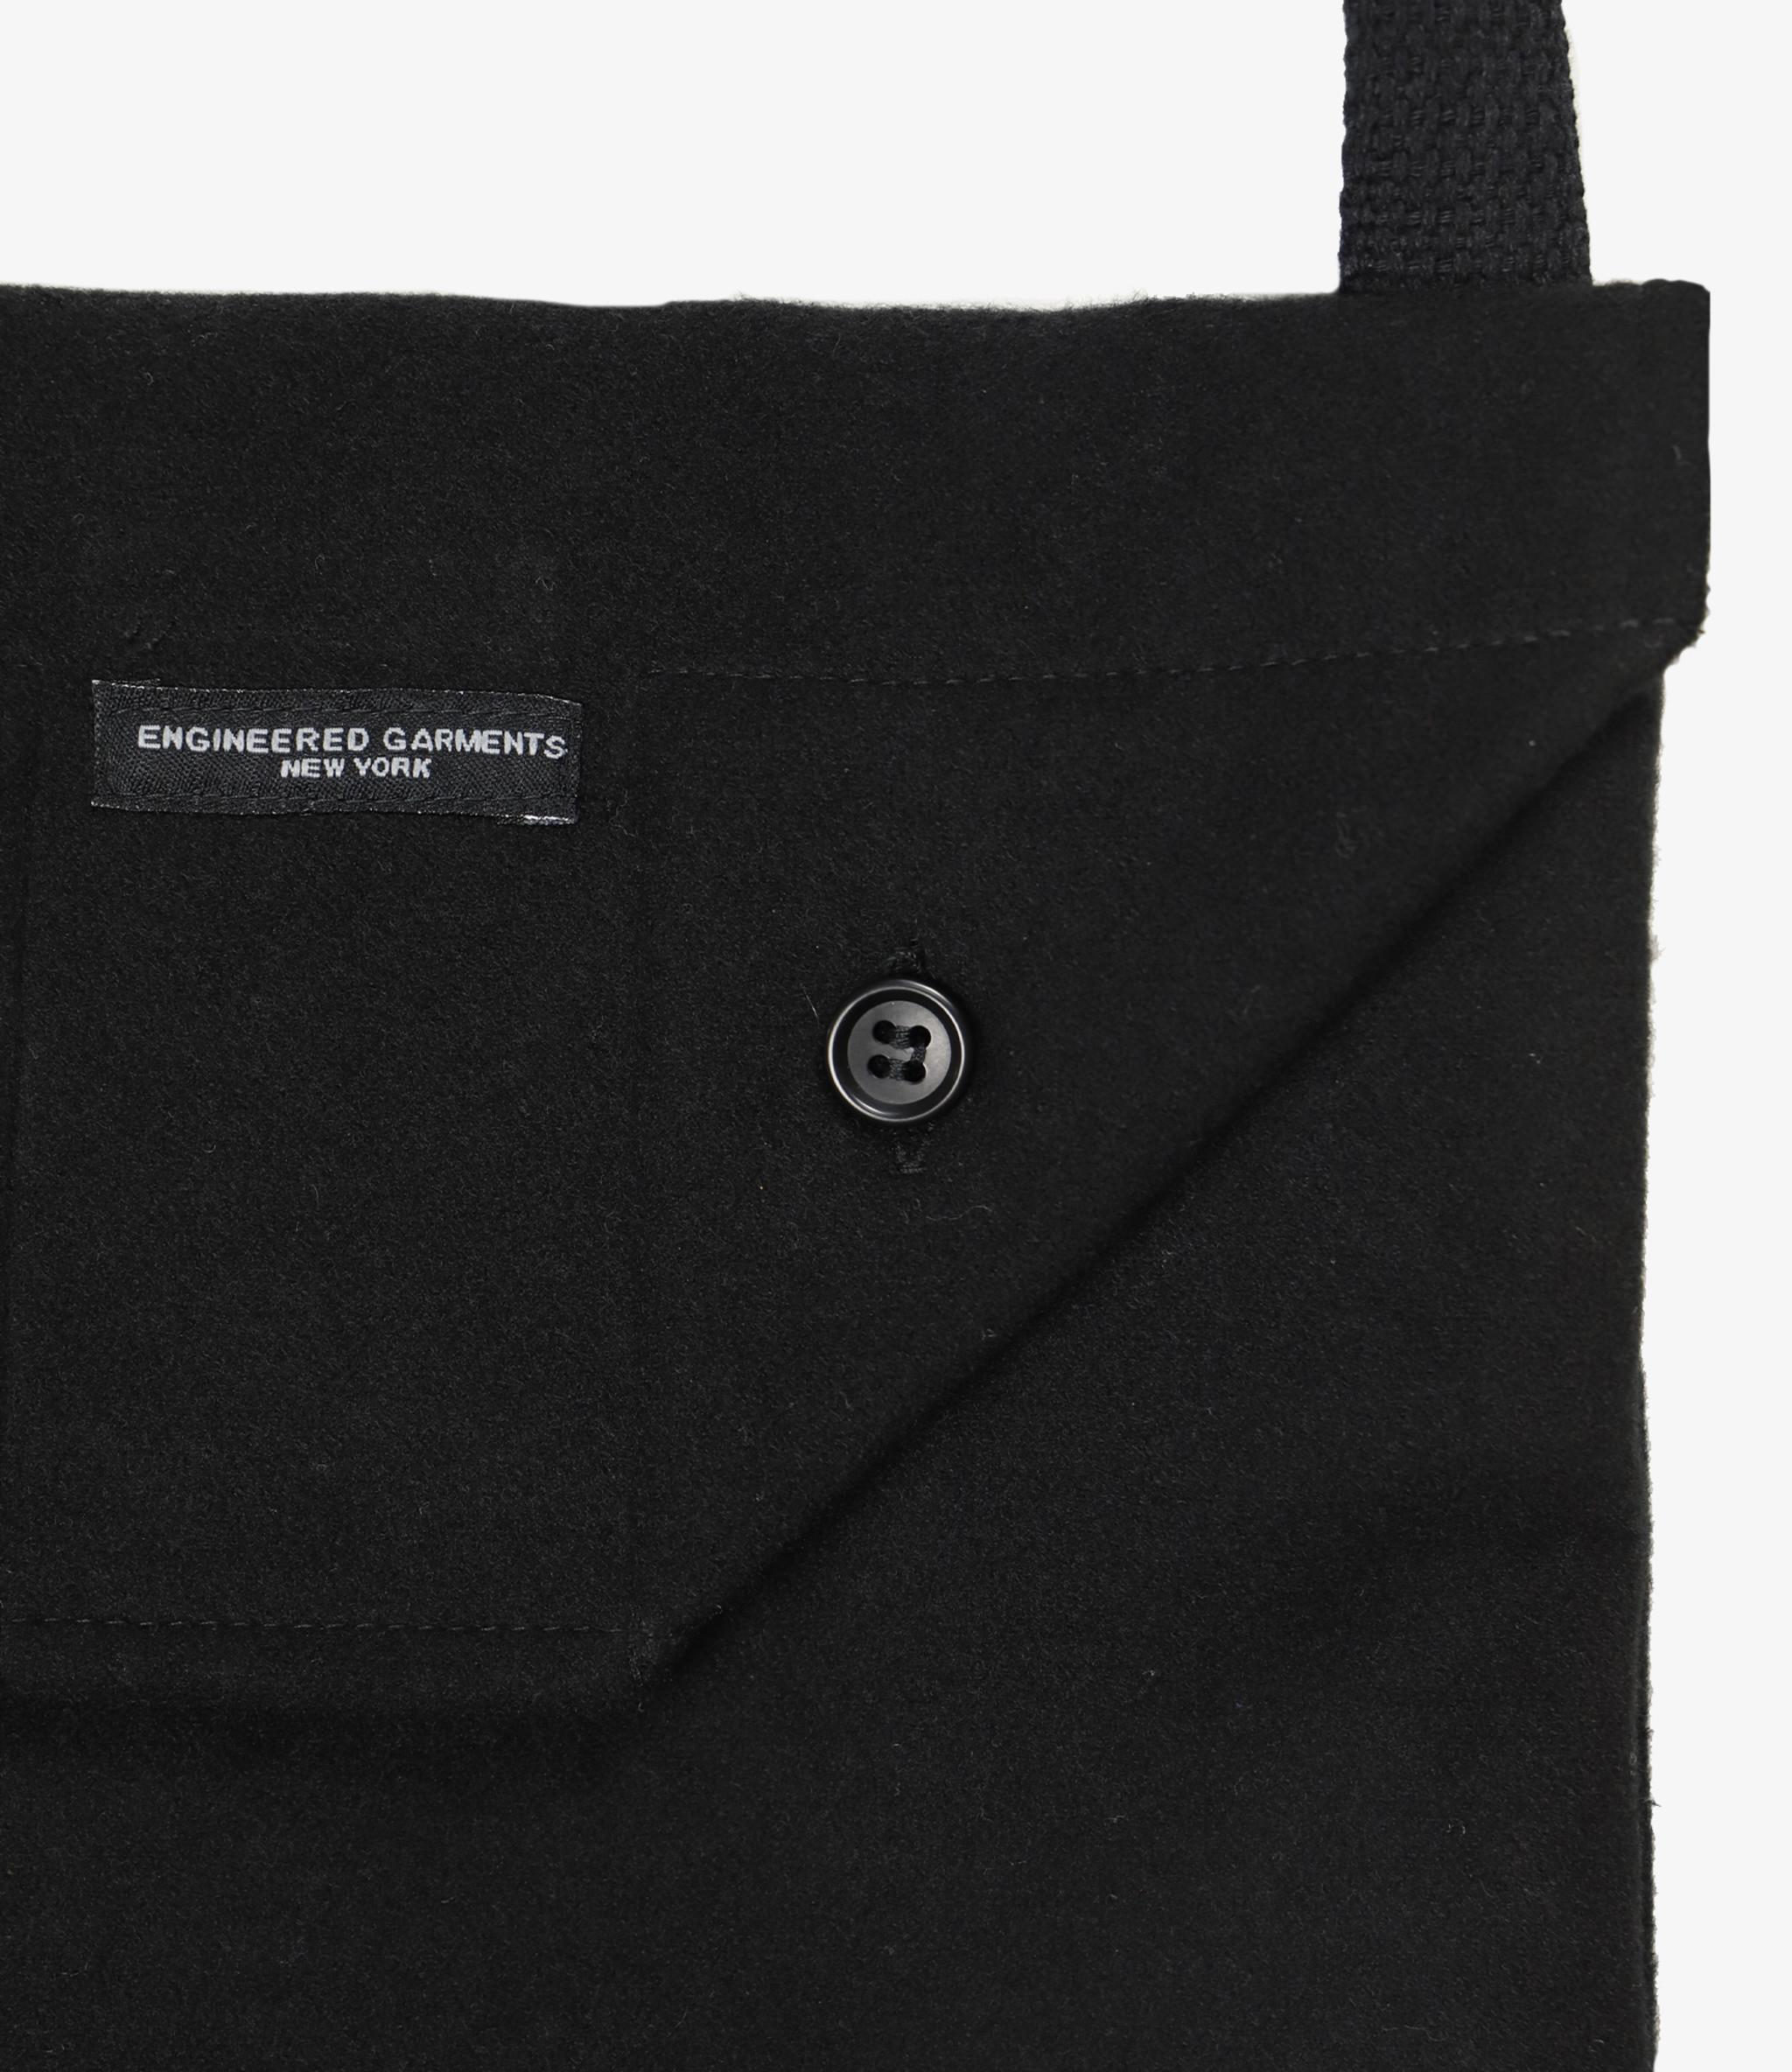 Engineered Garments Shoulder Pouch - Black Polyester Fake Melton